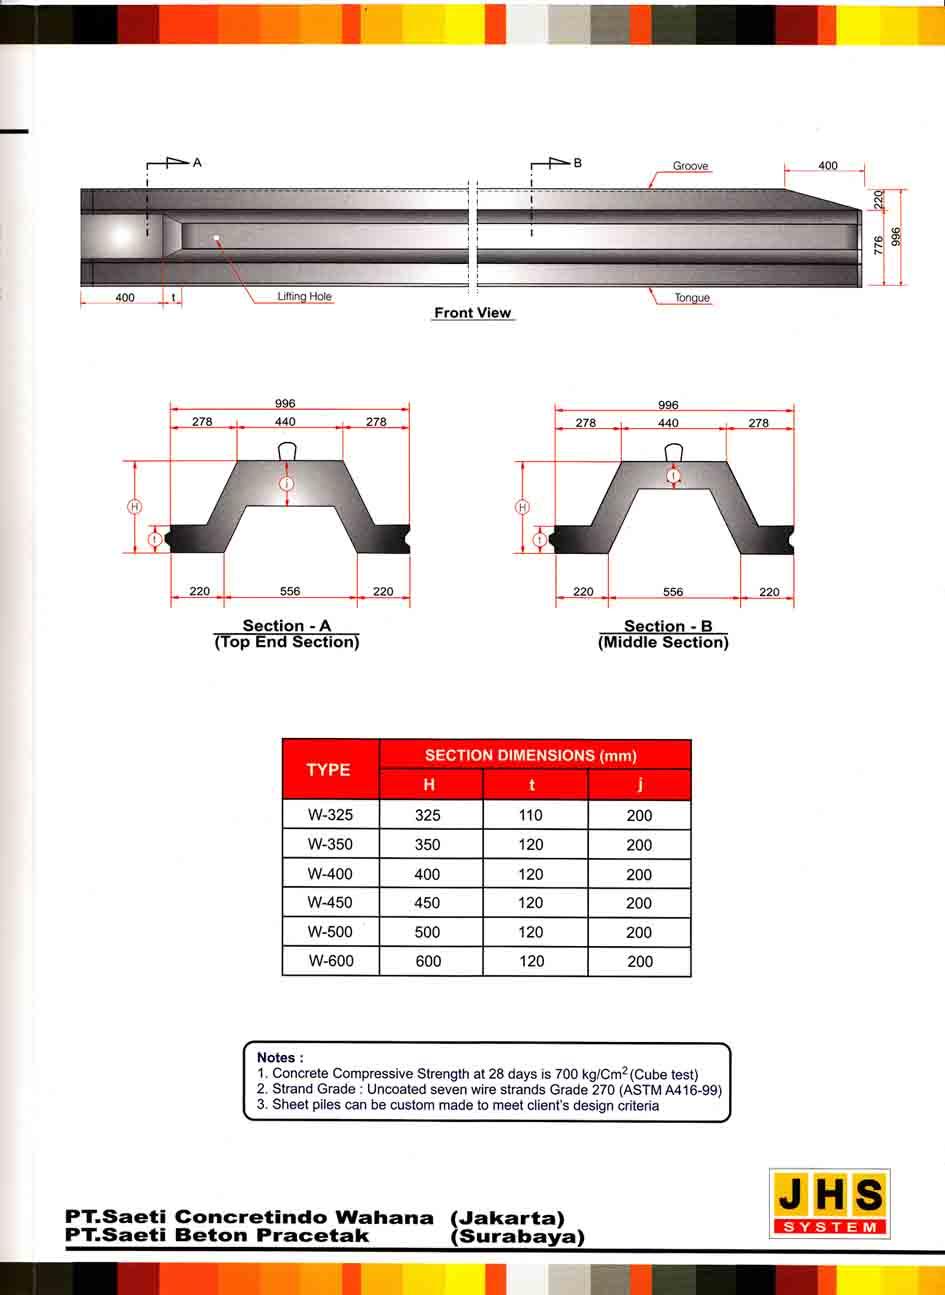 Jenis Baja Ringan Untuk Tiang Pc Corrugated Sheet Piles (jhs System) - Media Bangunan